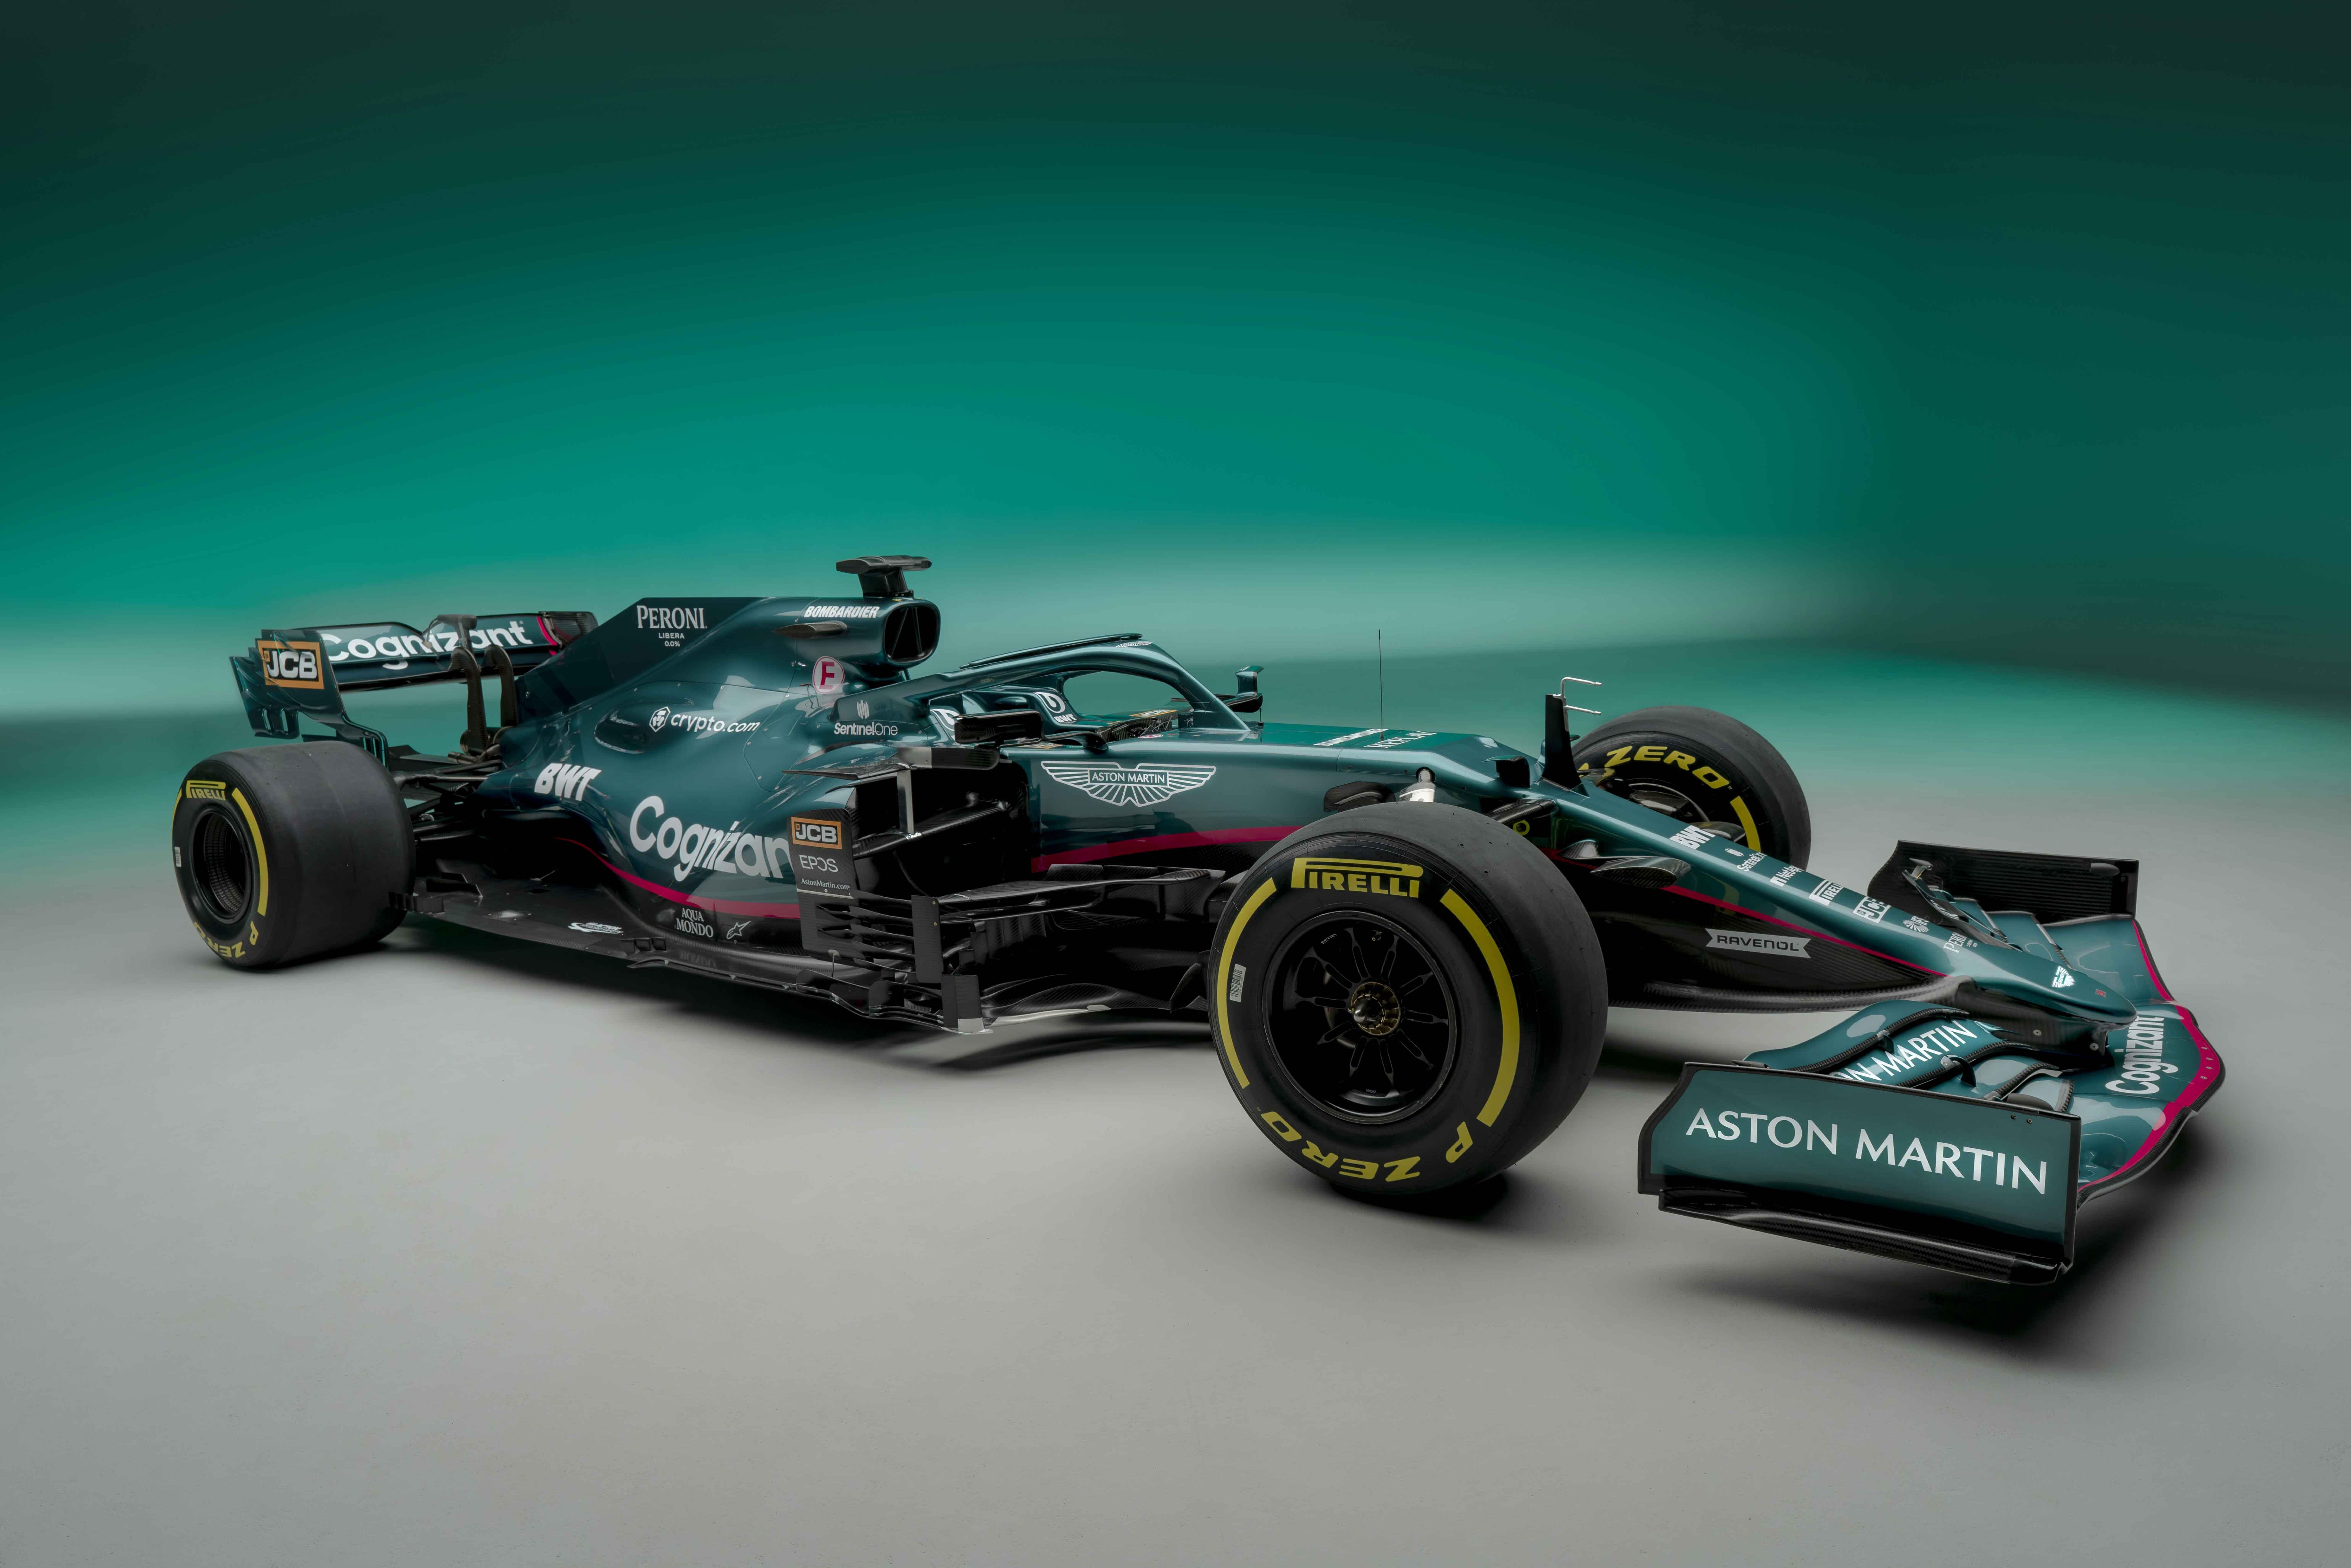 Aston Martin begins New Era with Return to Formula One